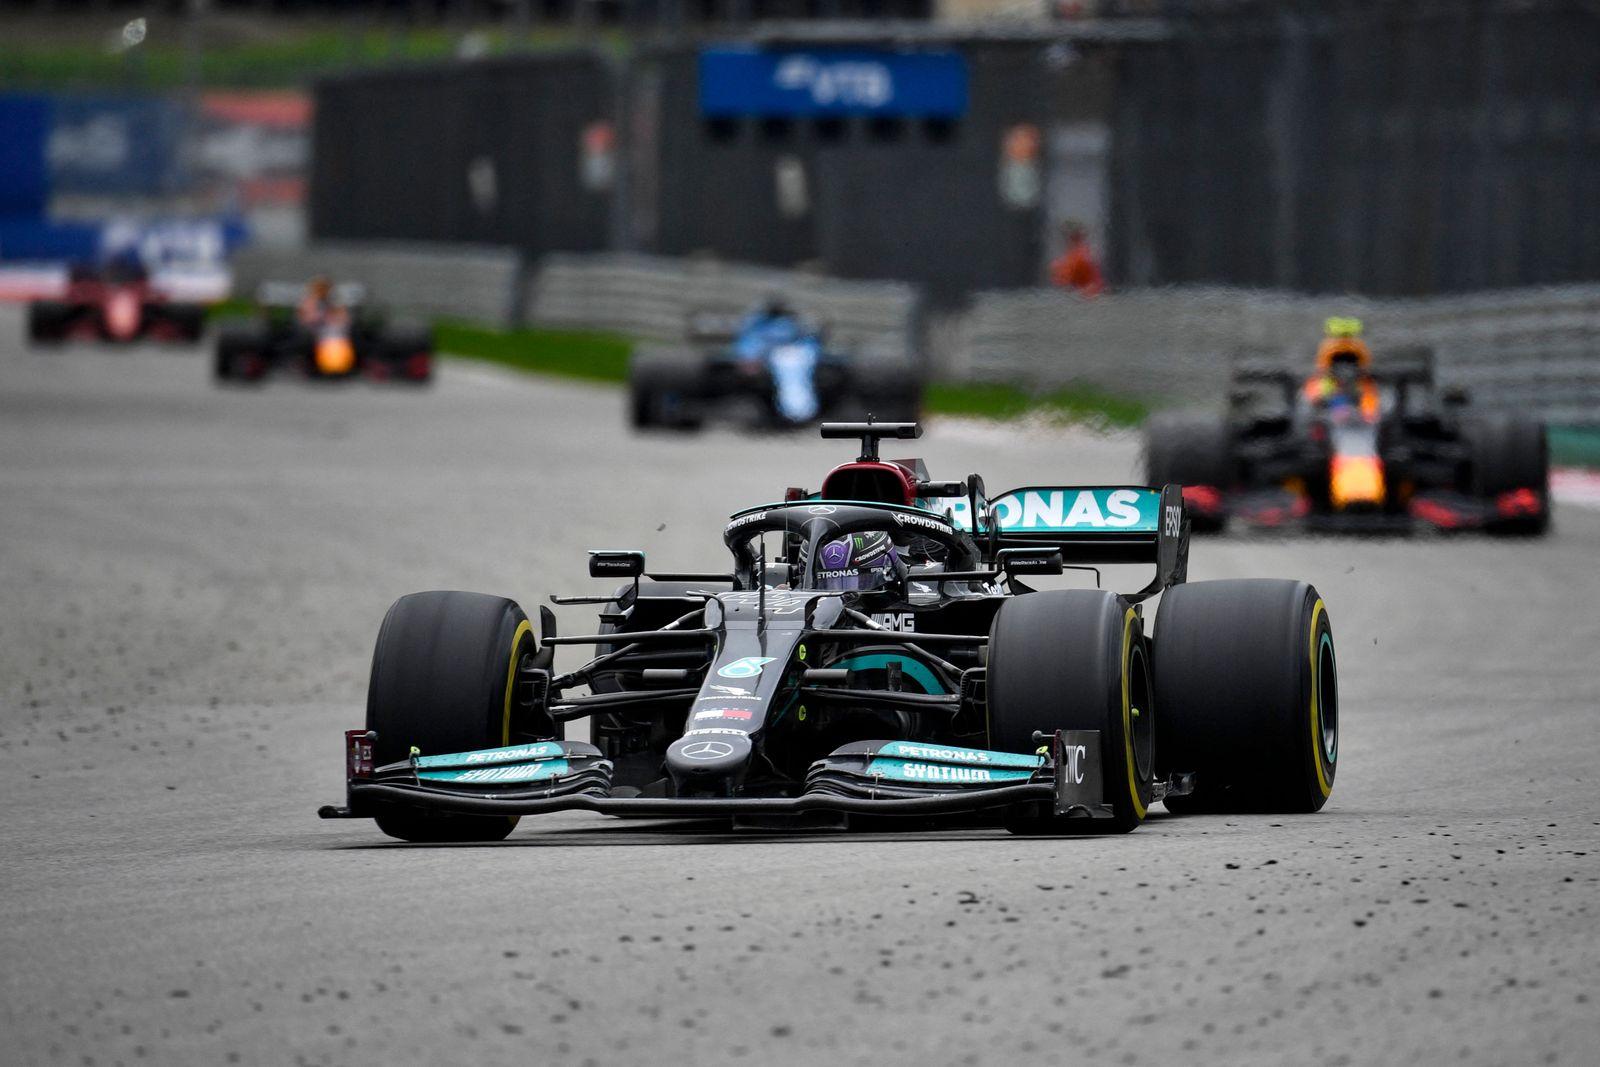 AUTO-PRIX-F1-RUS-RACE